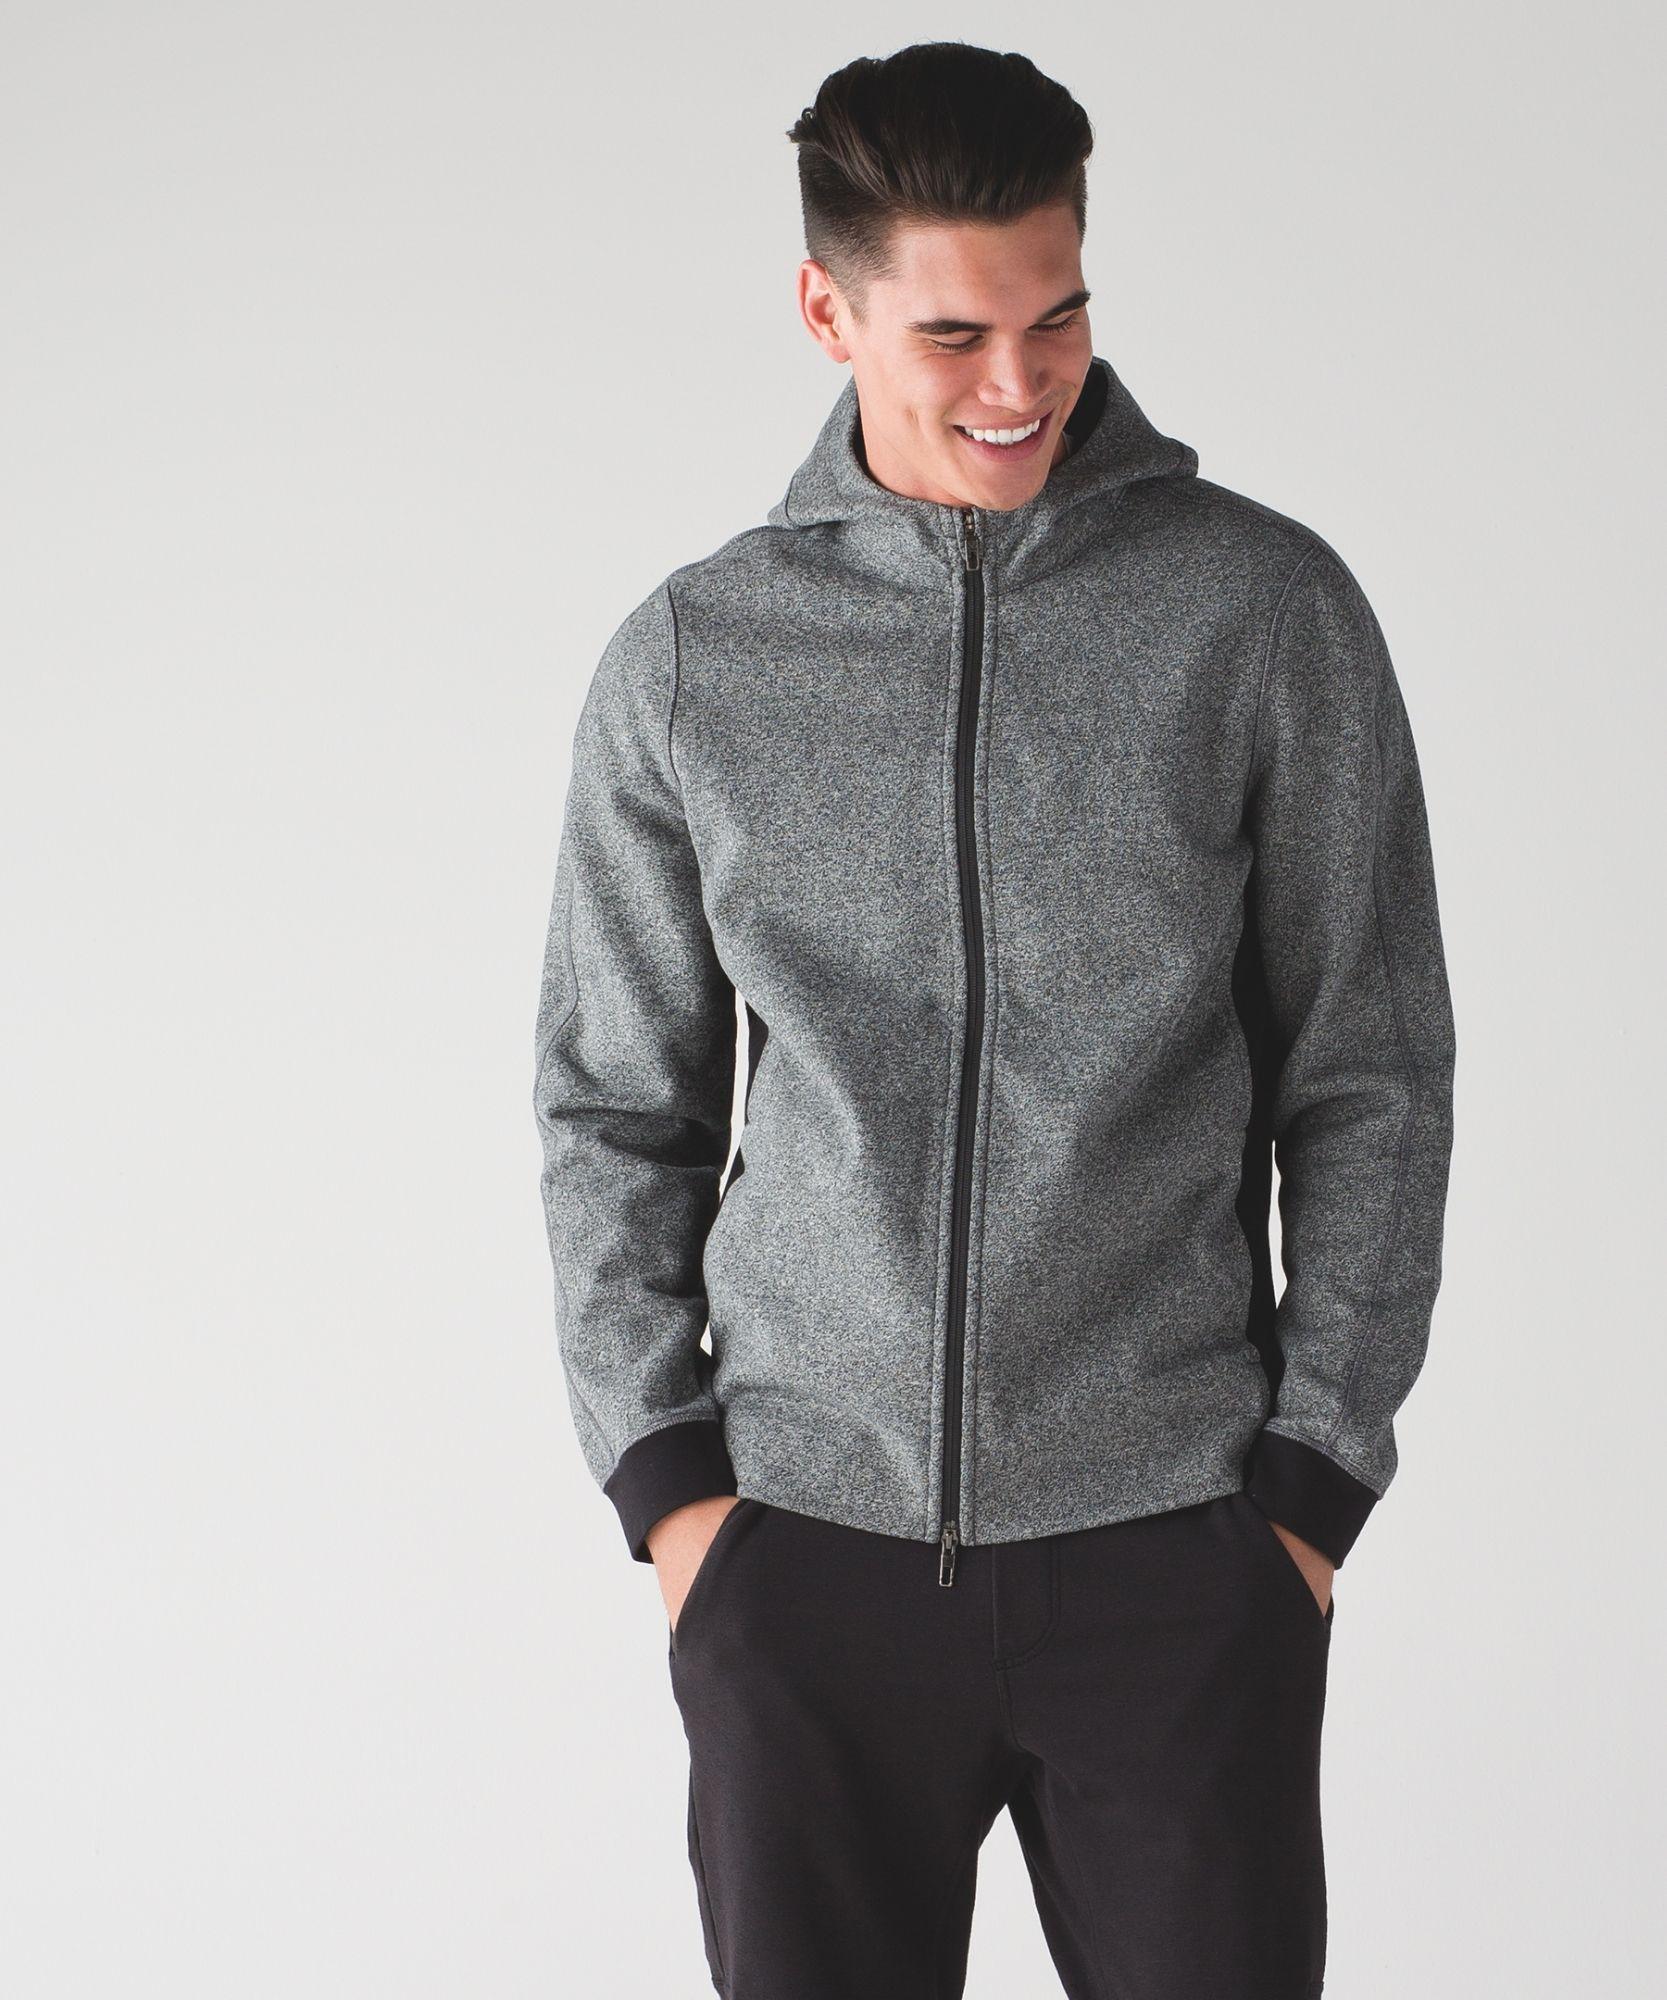 Mens jacket marks and spencer - Men S Workout Hoodie Heavyweight Hoodie Lululemon